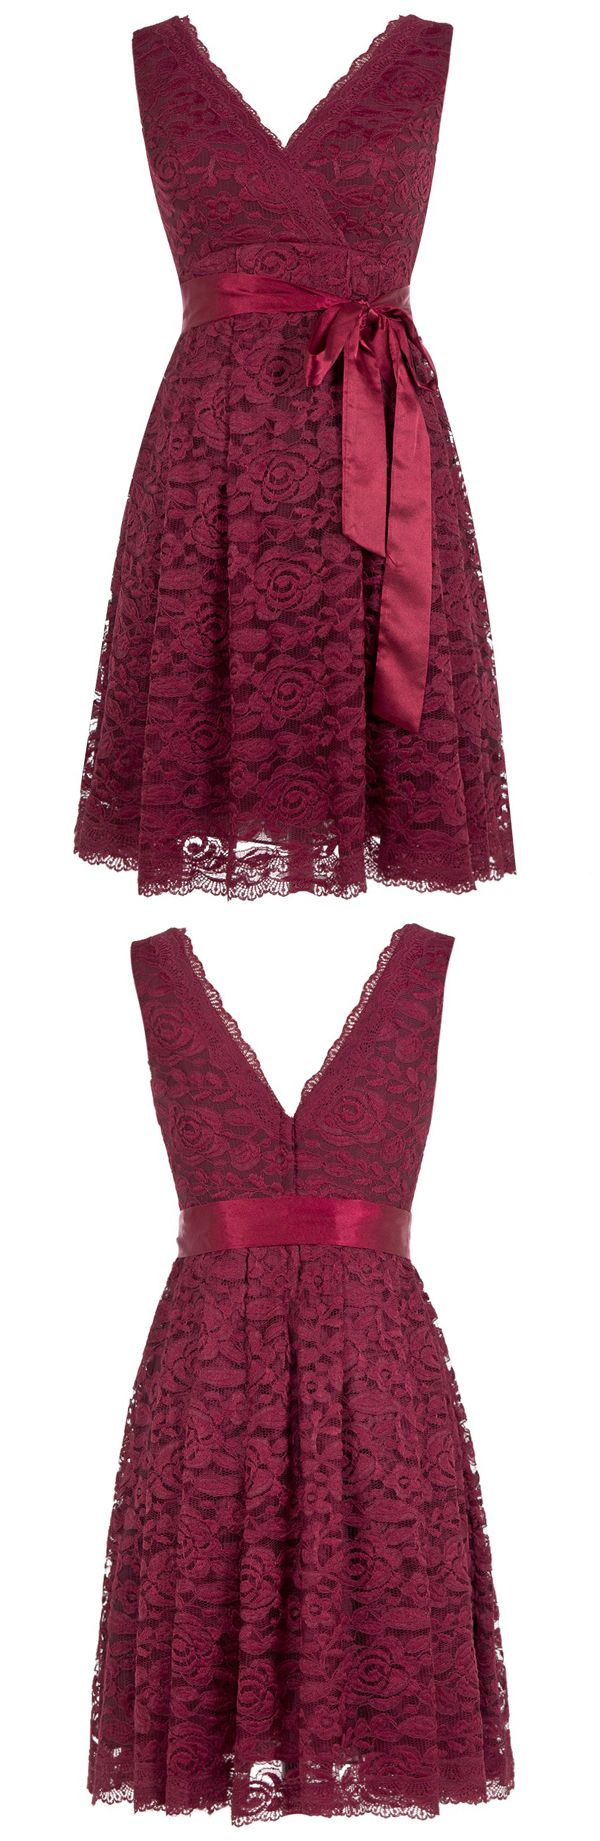 Cute A Line V Neck Short Knee Length Burgundy Lace Bridesmaid Dress